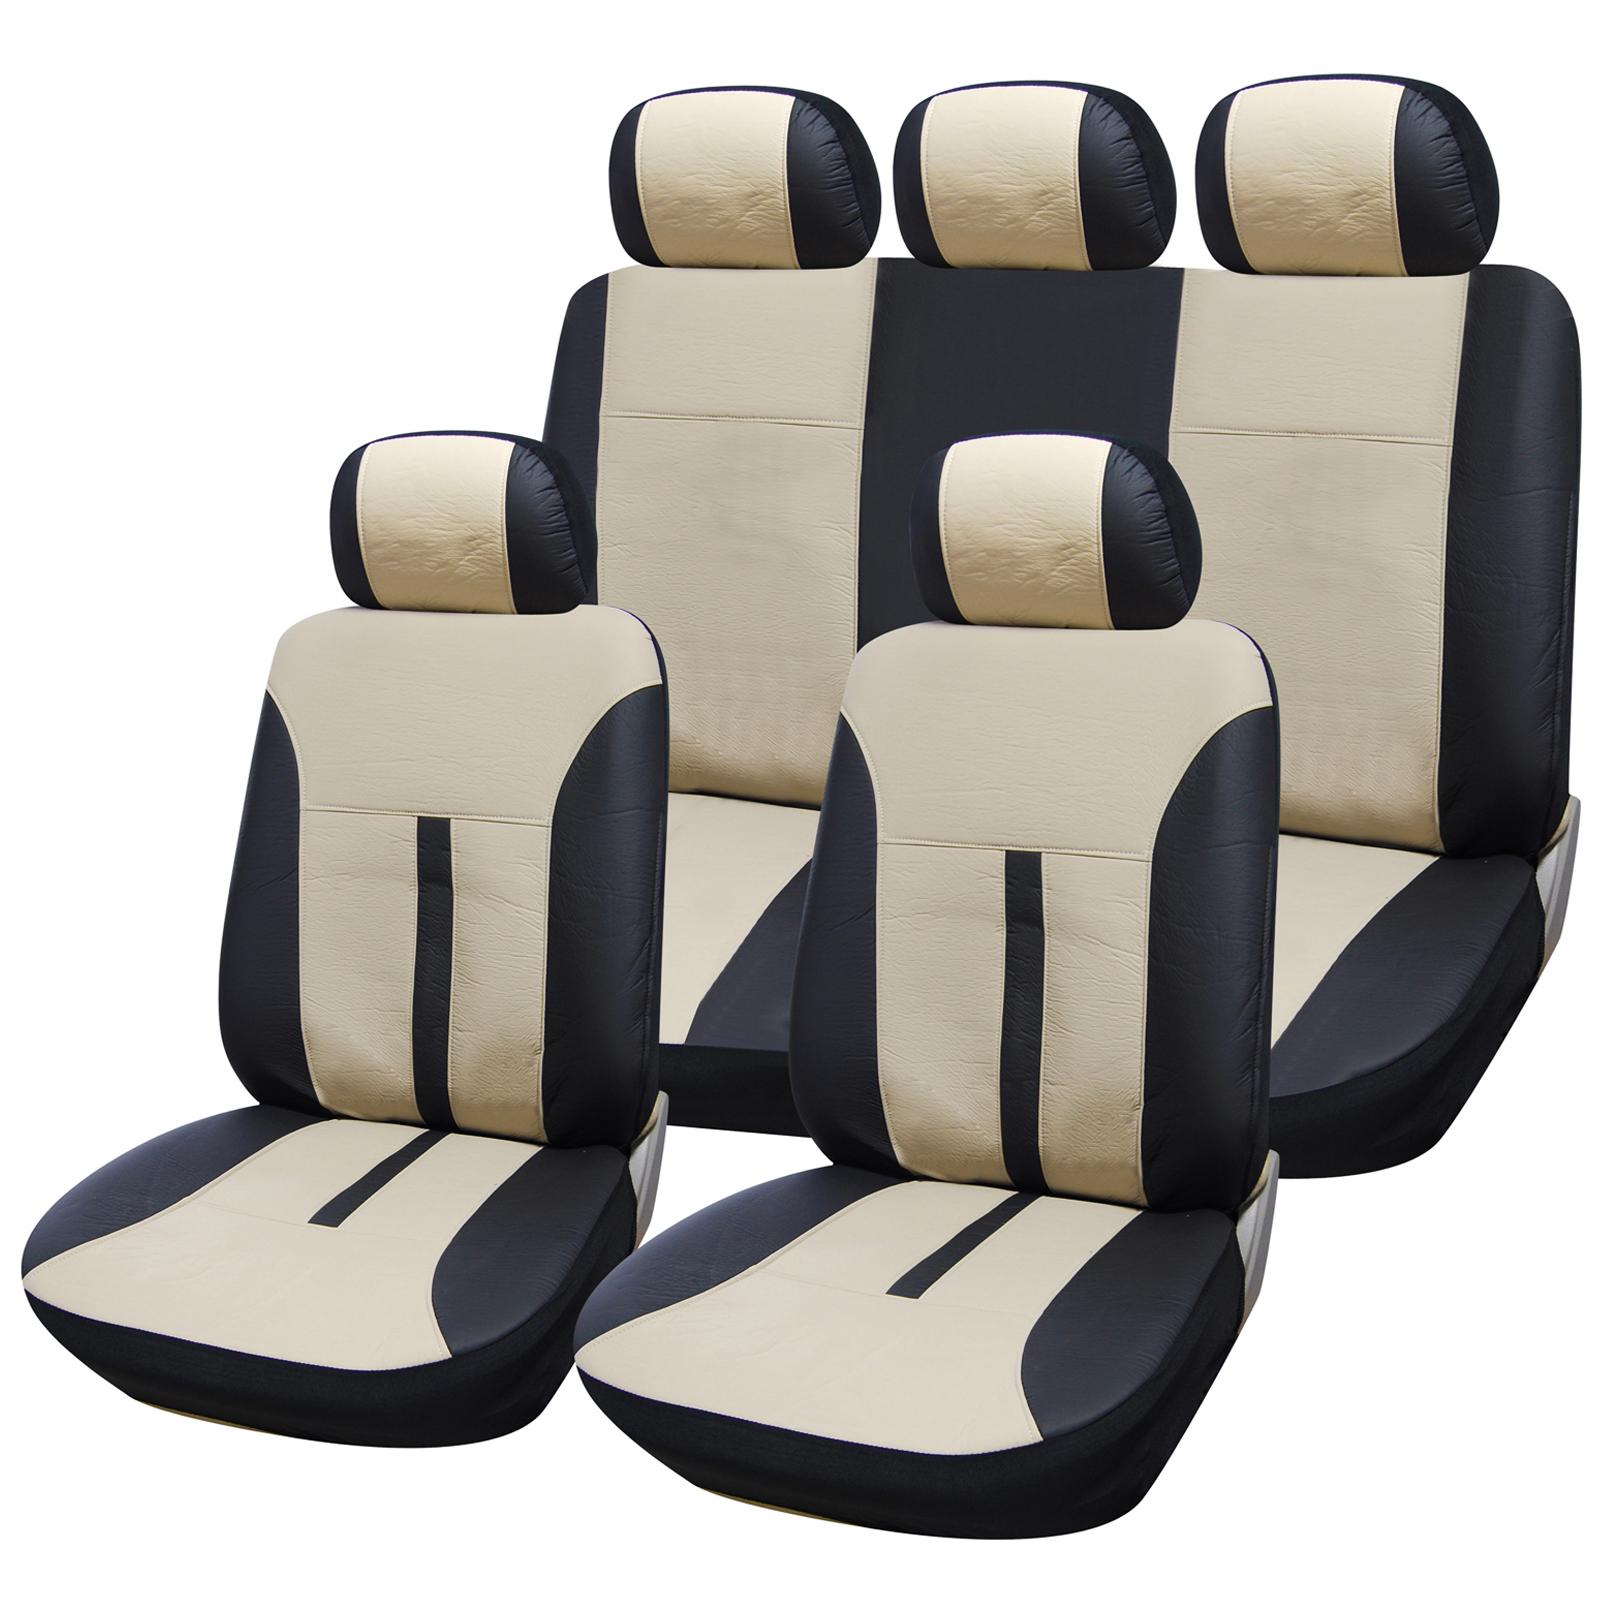 autositzbez ge schonbez ge universal auto sitzbezug schonbezug kunstleder 214 ebay. Black Bedroom Furniture Sets. Home Design Ideas